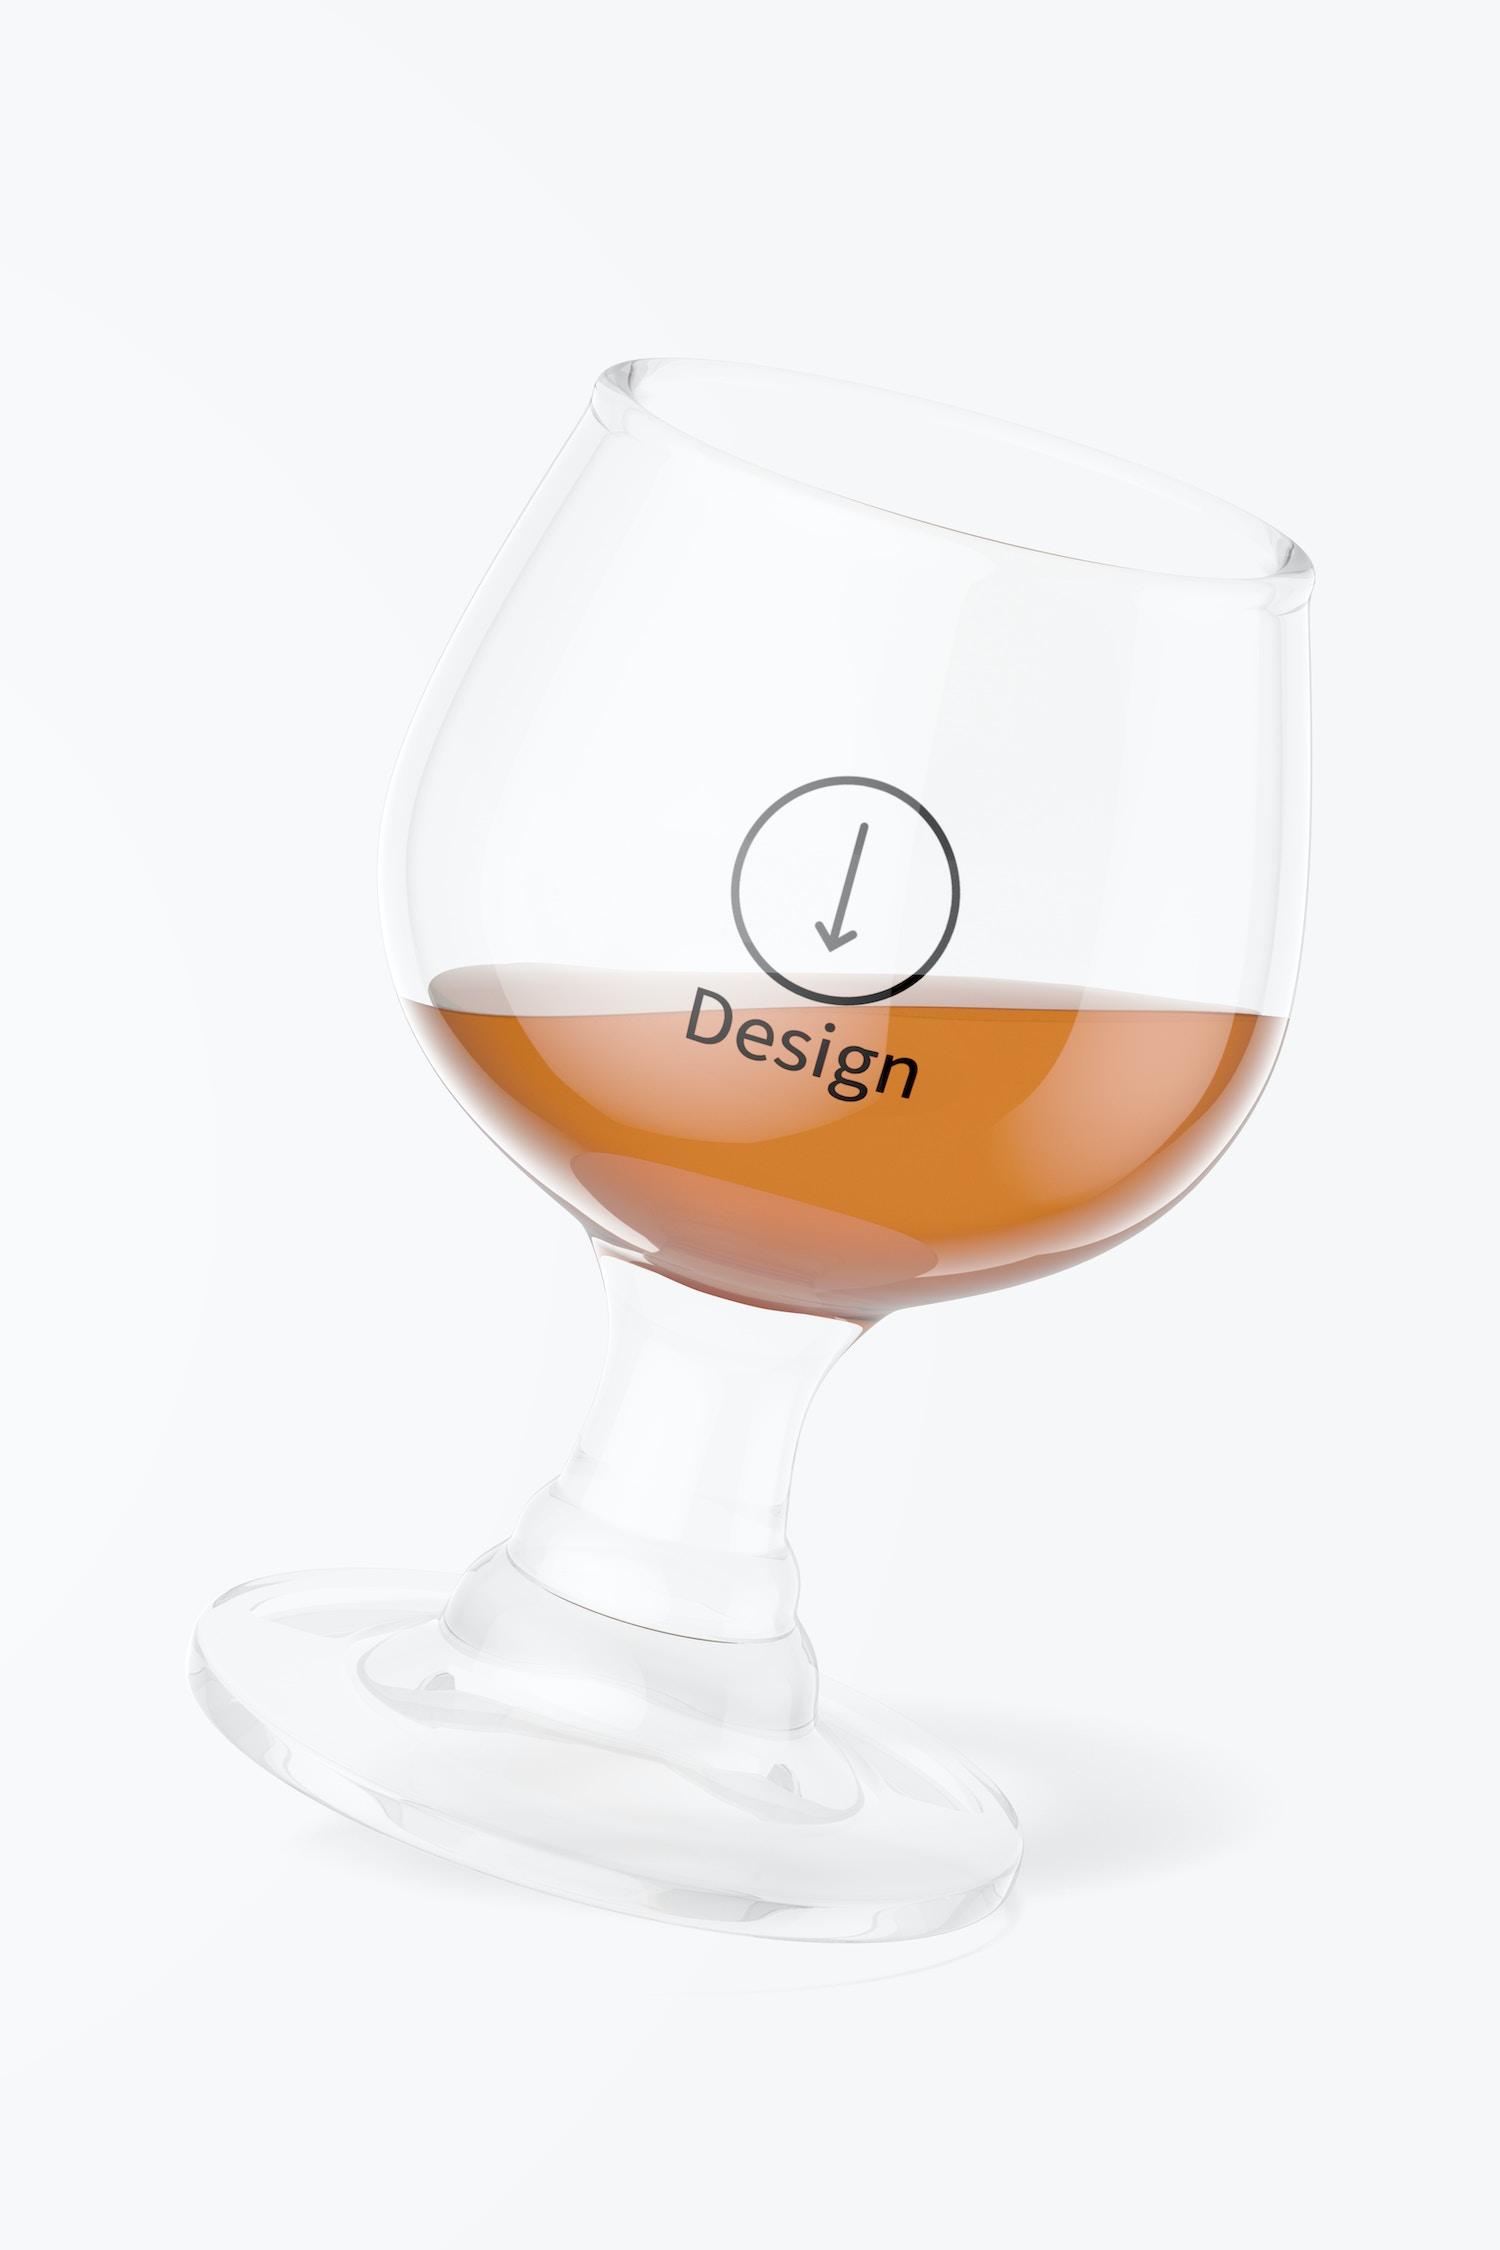 1.7 oz Glass Brandy Cup Mockup, Floating